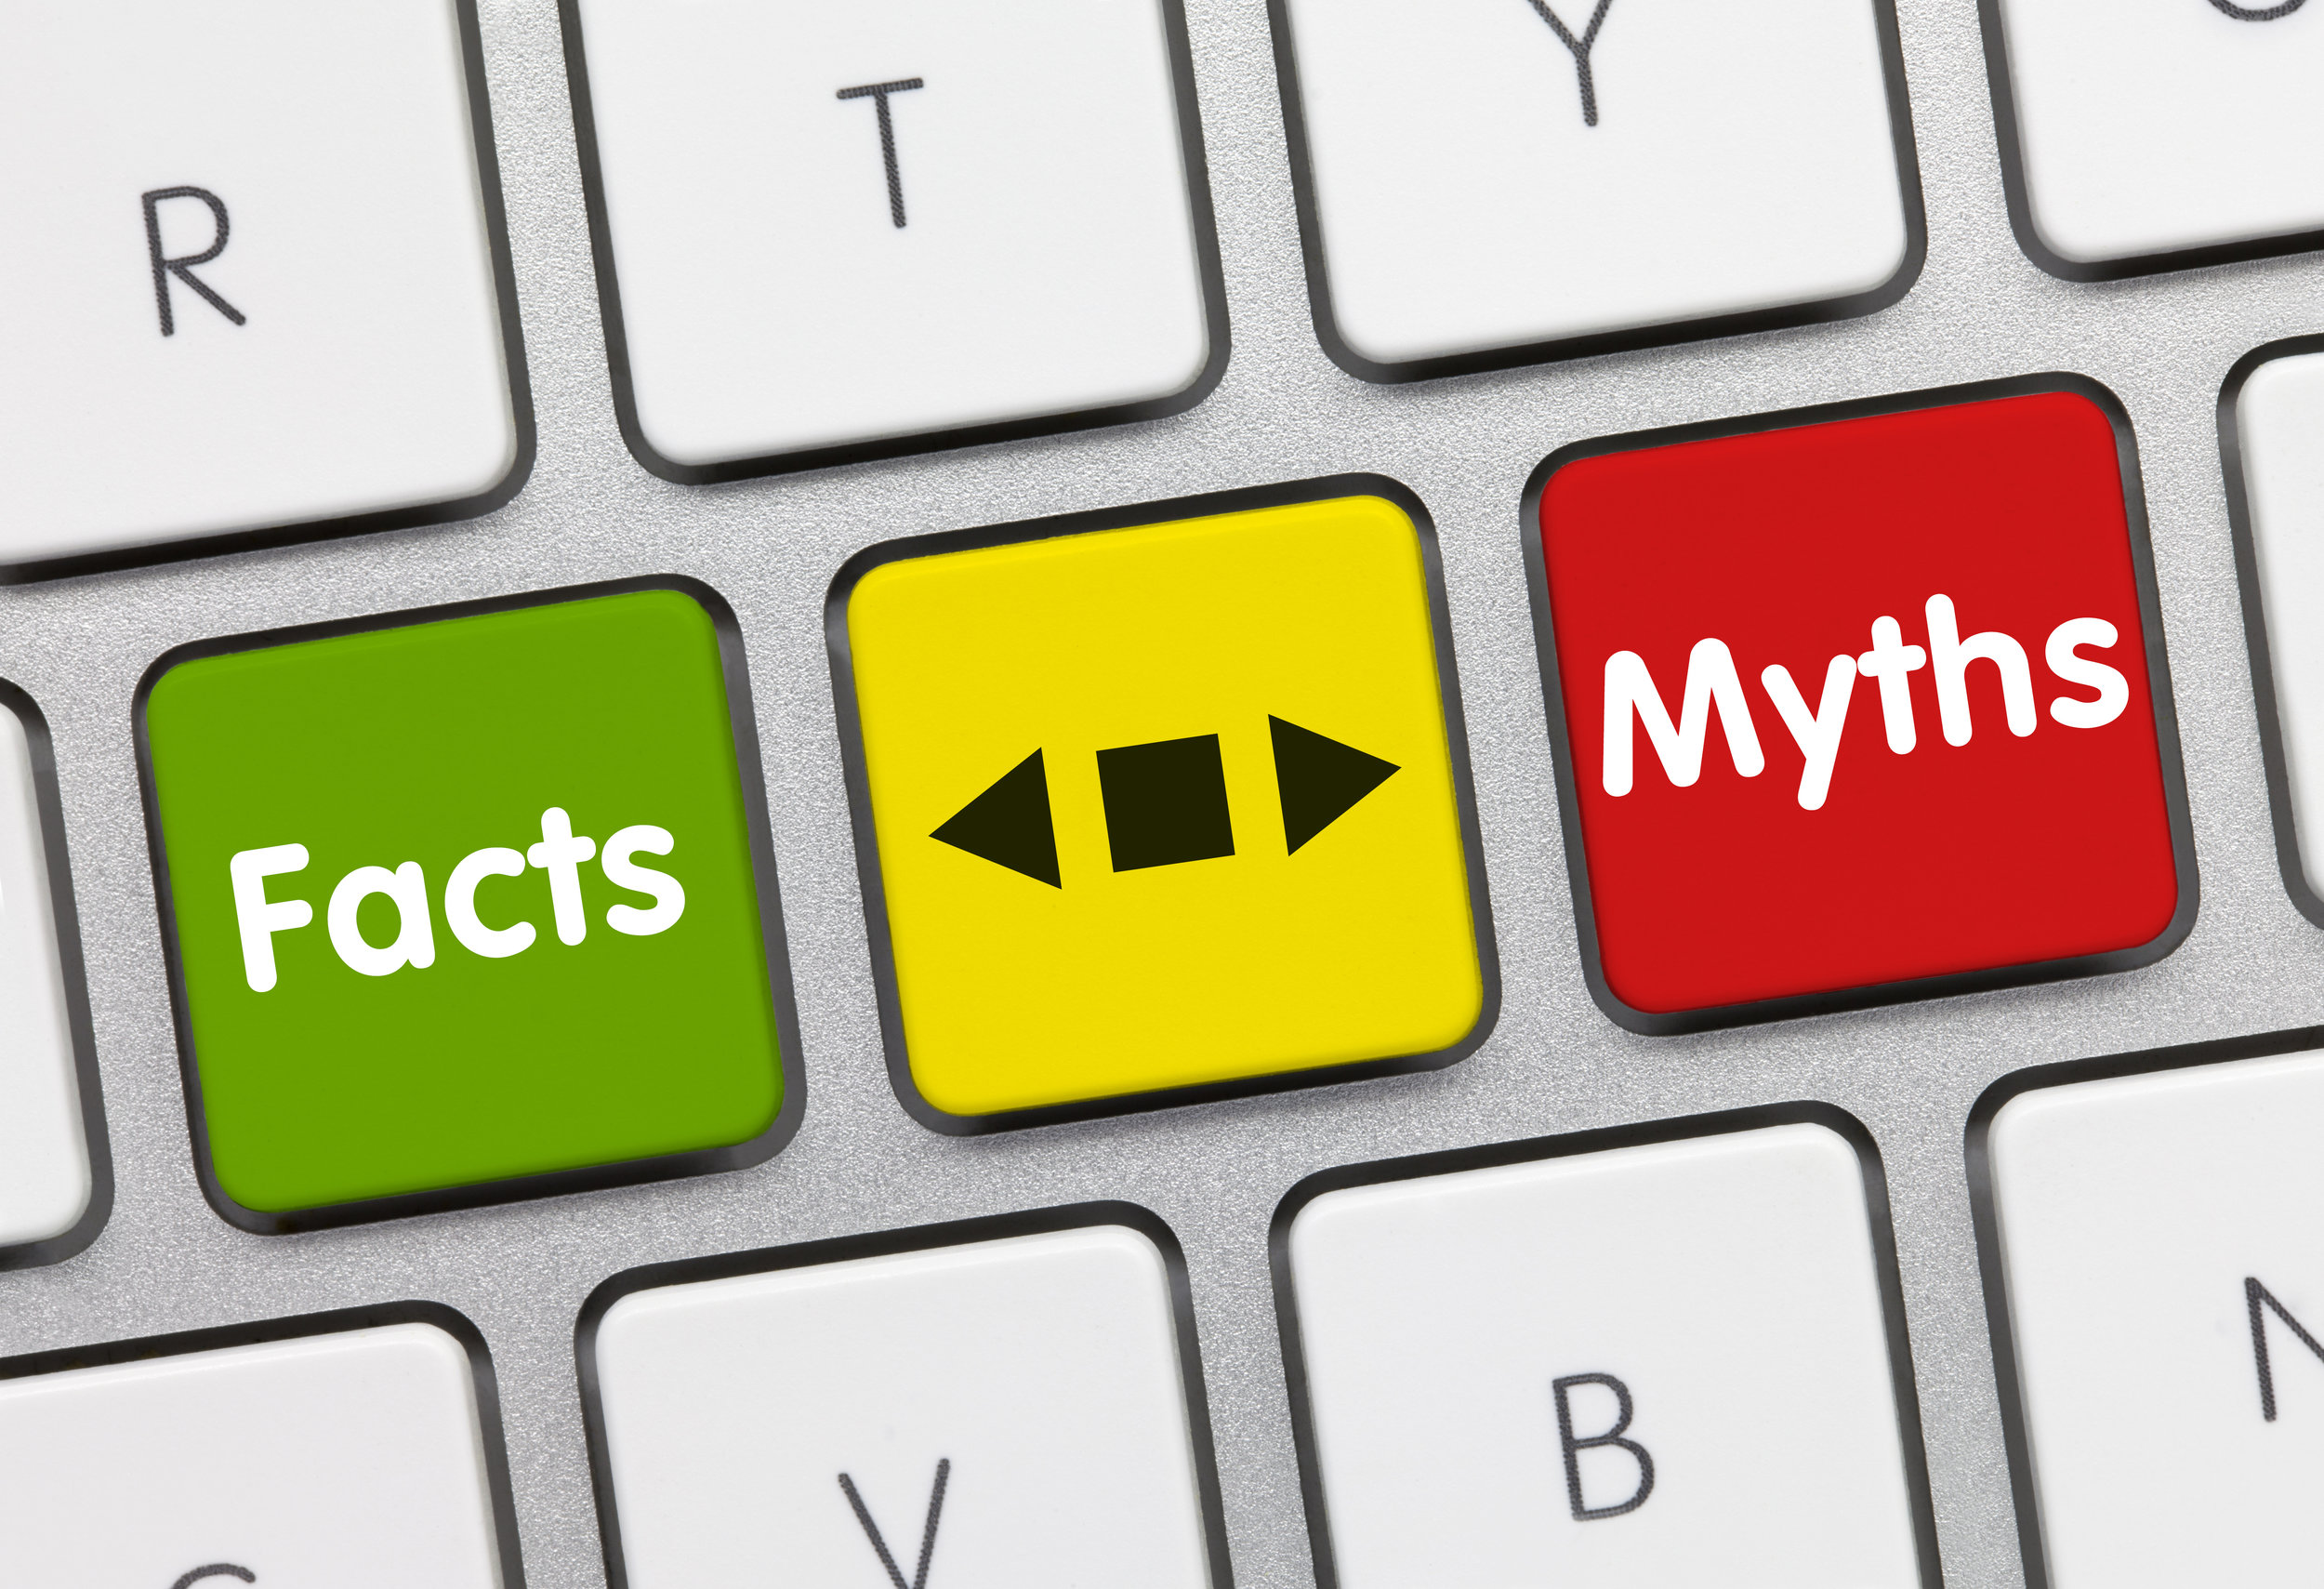 Facts vs myths AdobeStock_101029315.jpg